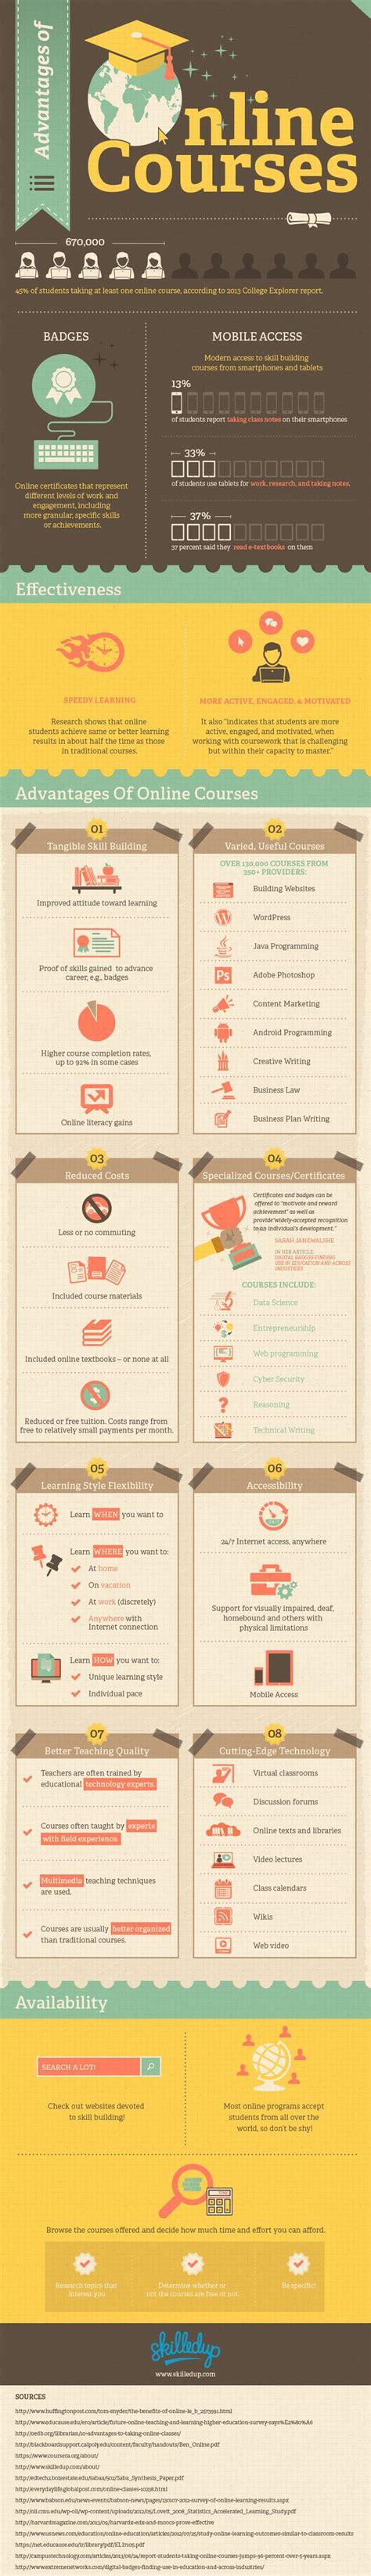 supplement versus complement advantages of courses infographic marketing top